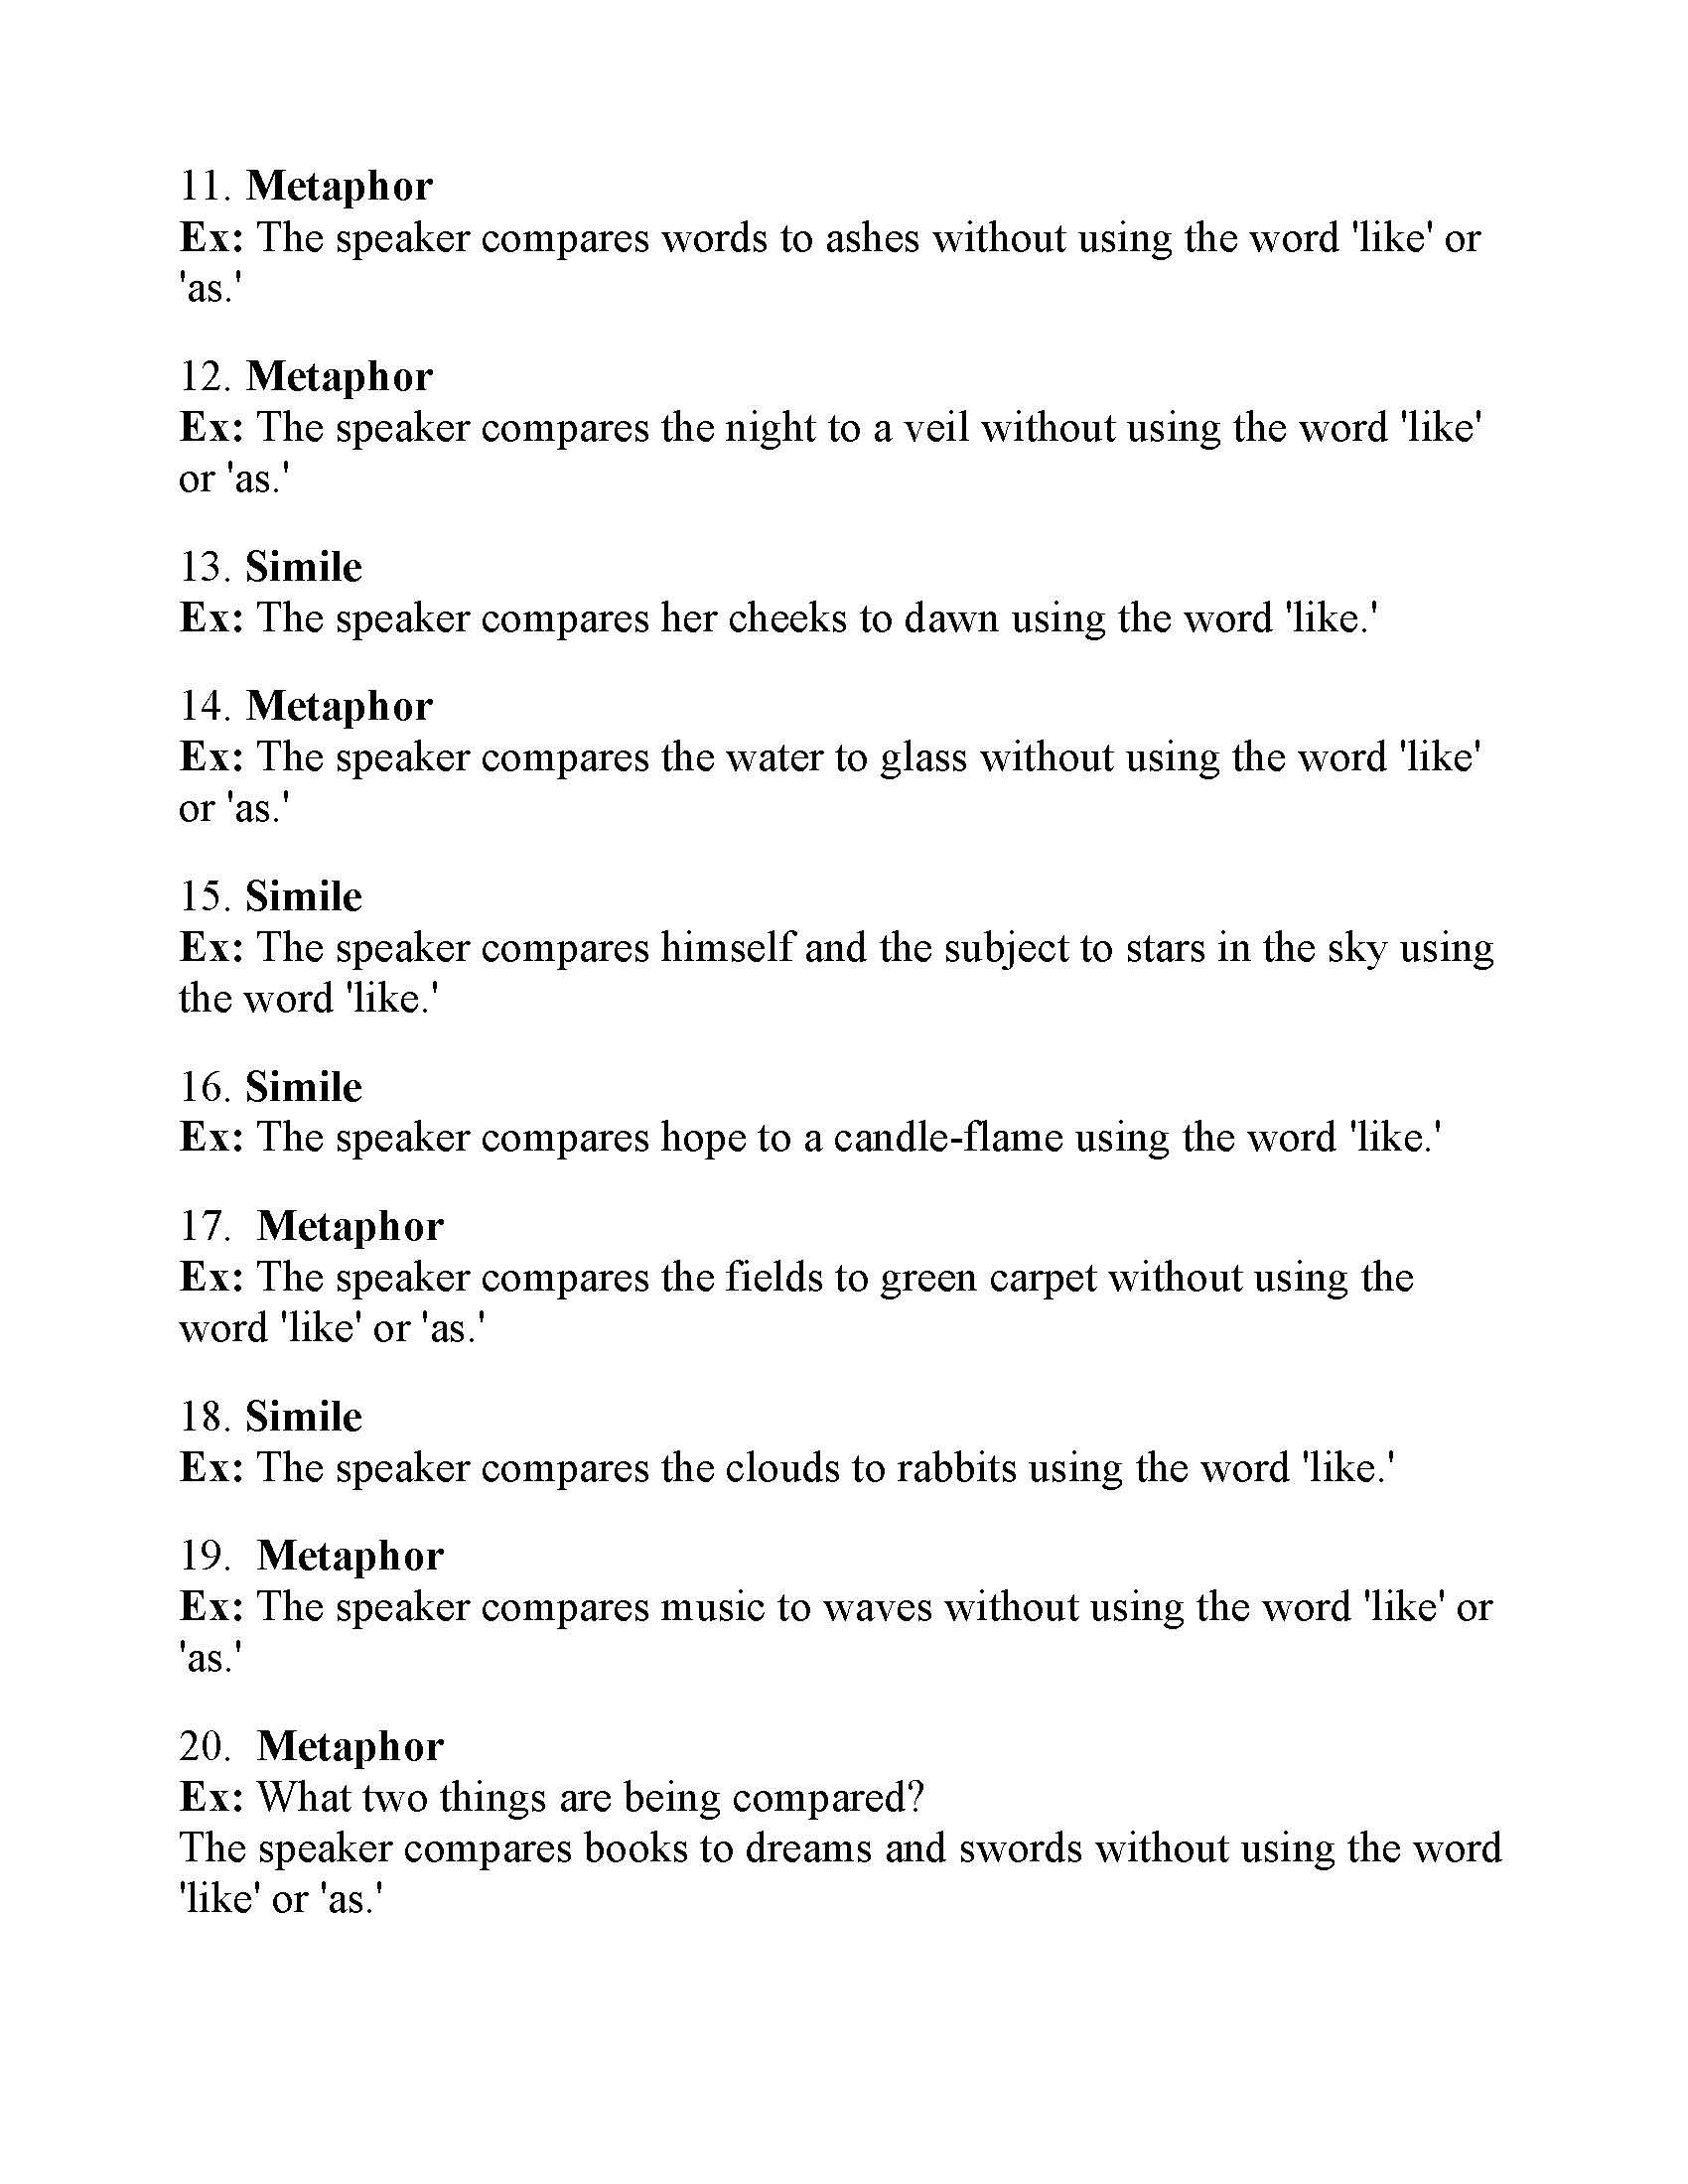 Simile And Metaphor Worksheet 1   TUTORE.ORG   Master of ...